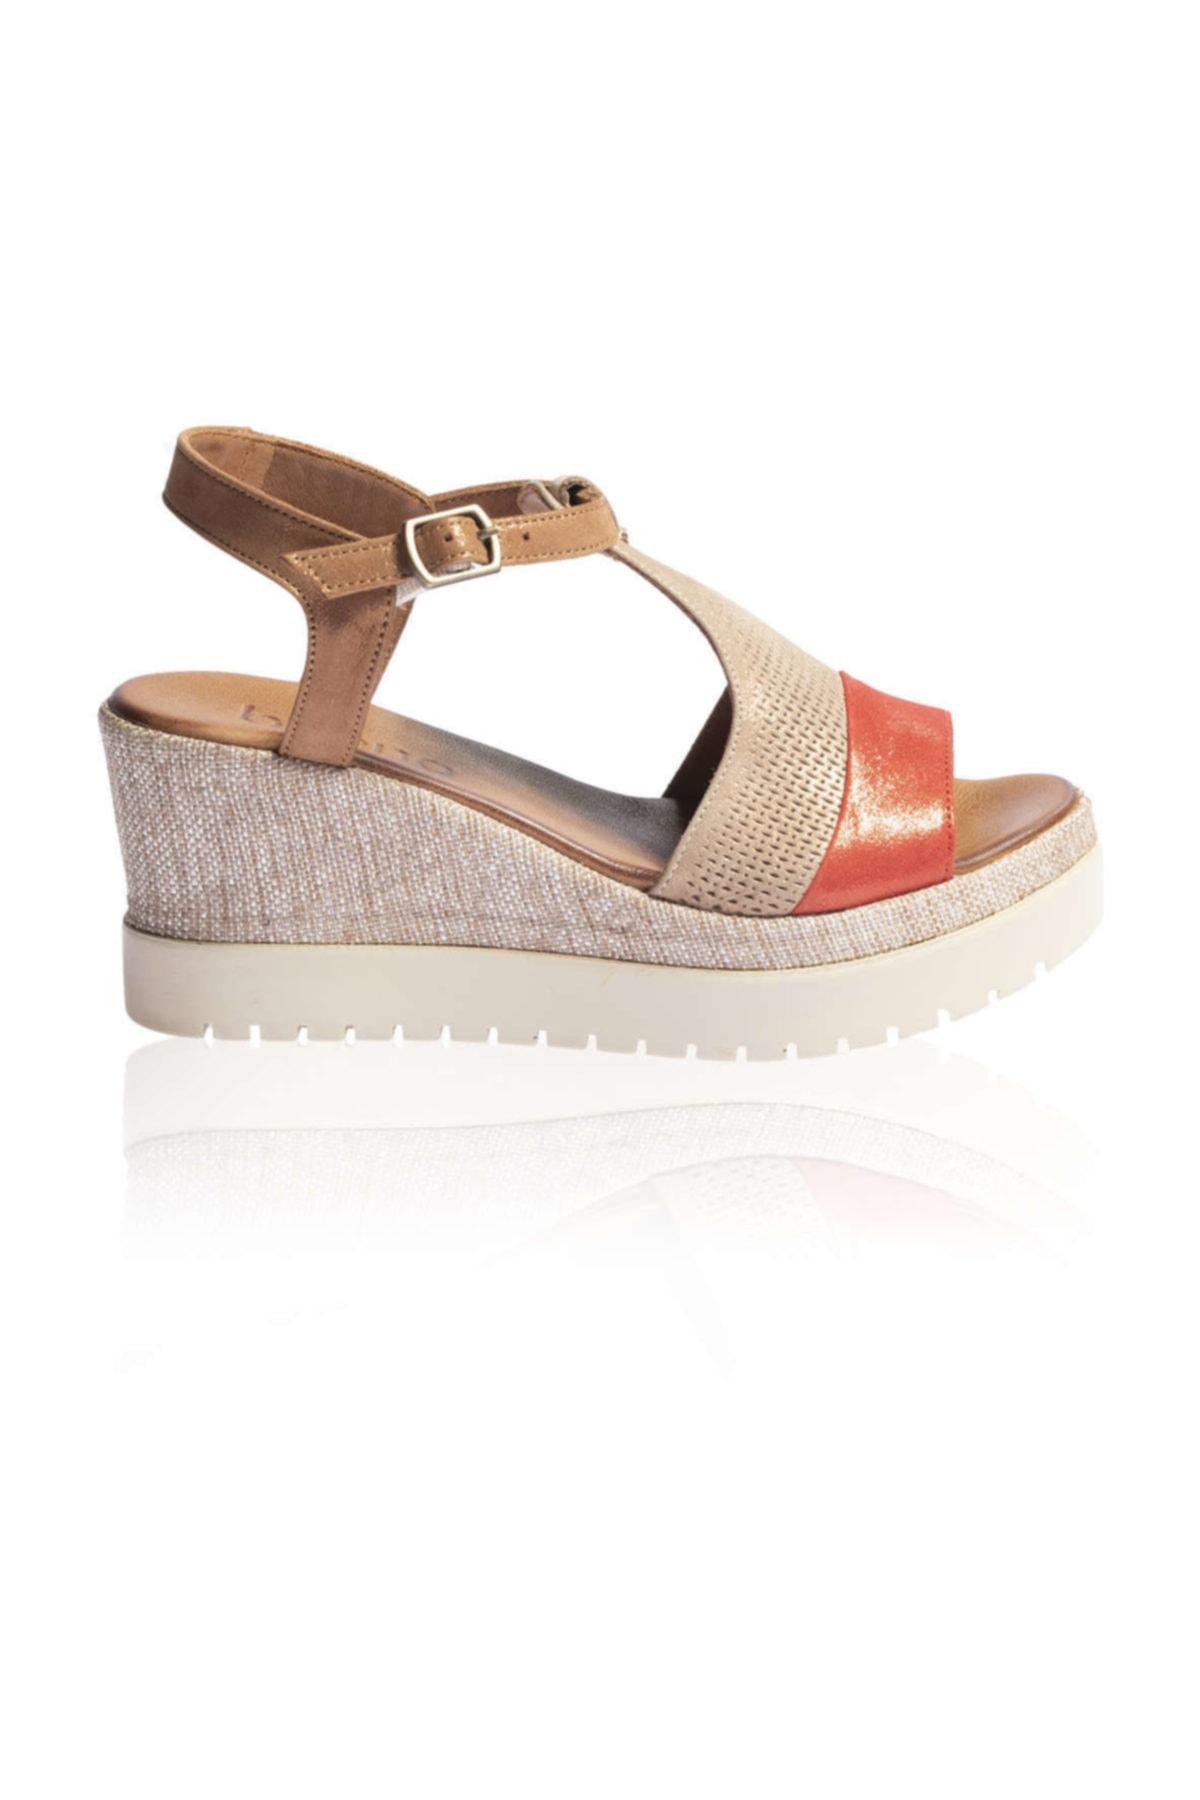 BUENO Shoes Gri BayKadın Sandalet 9n3502 2